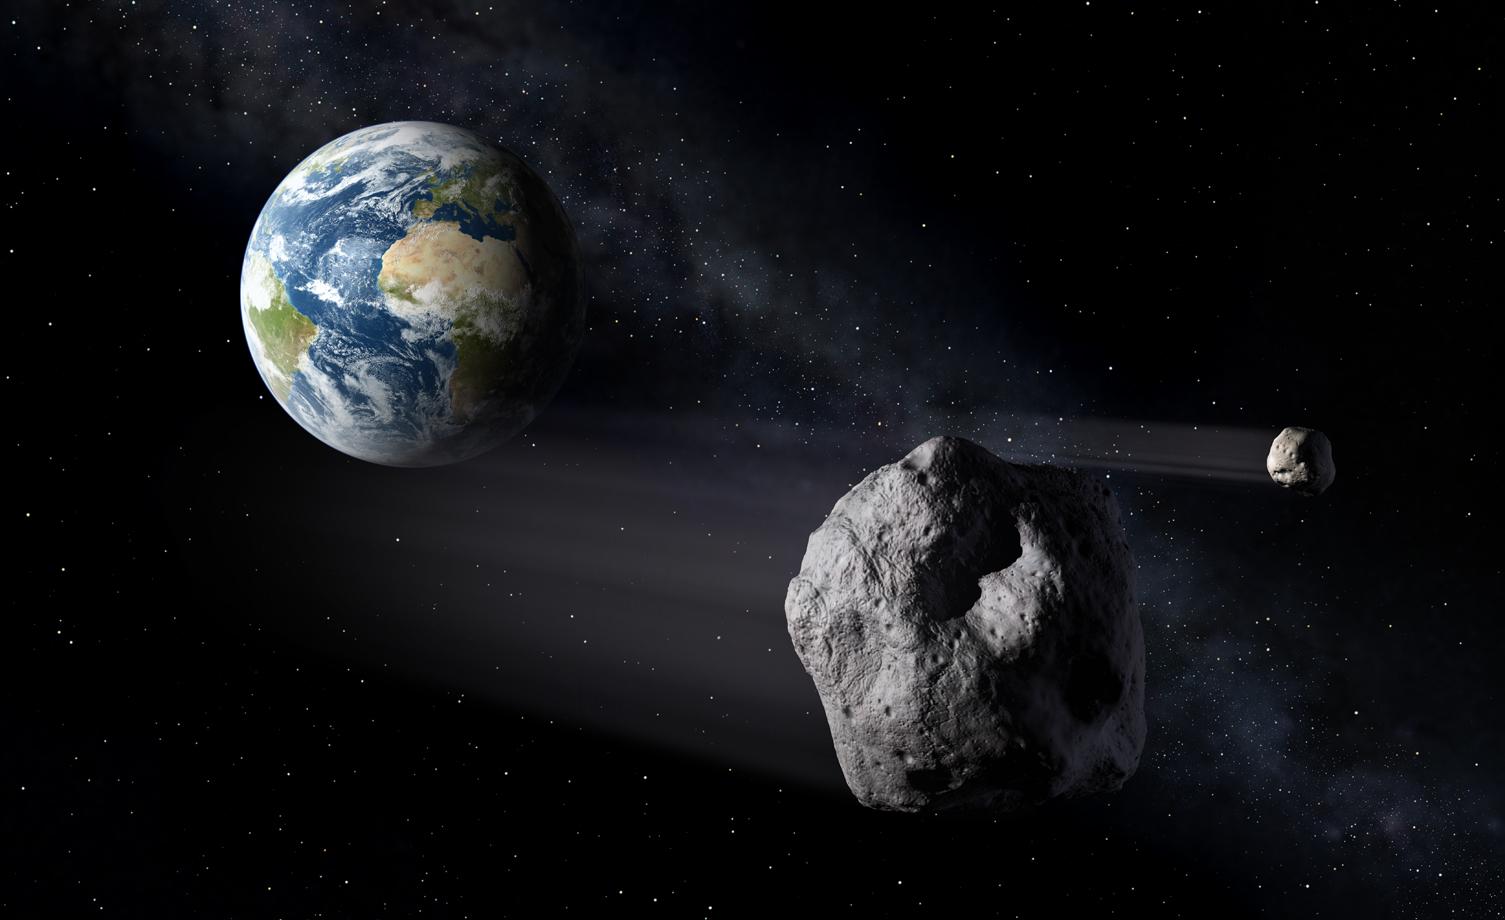 Asteróide vai passar muito próximo da Terra esta quinta-feira